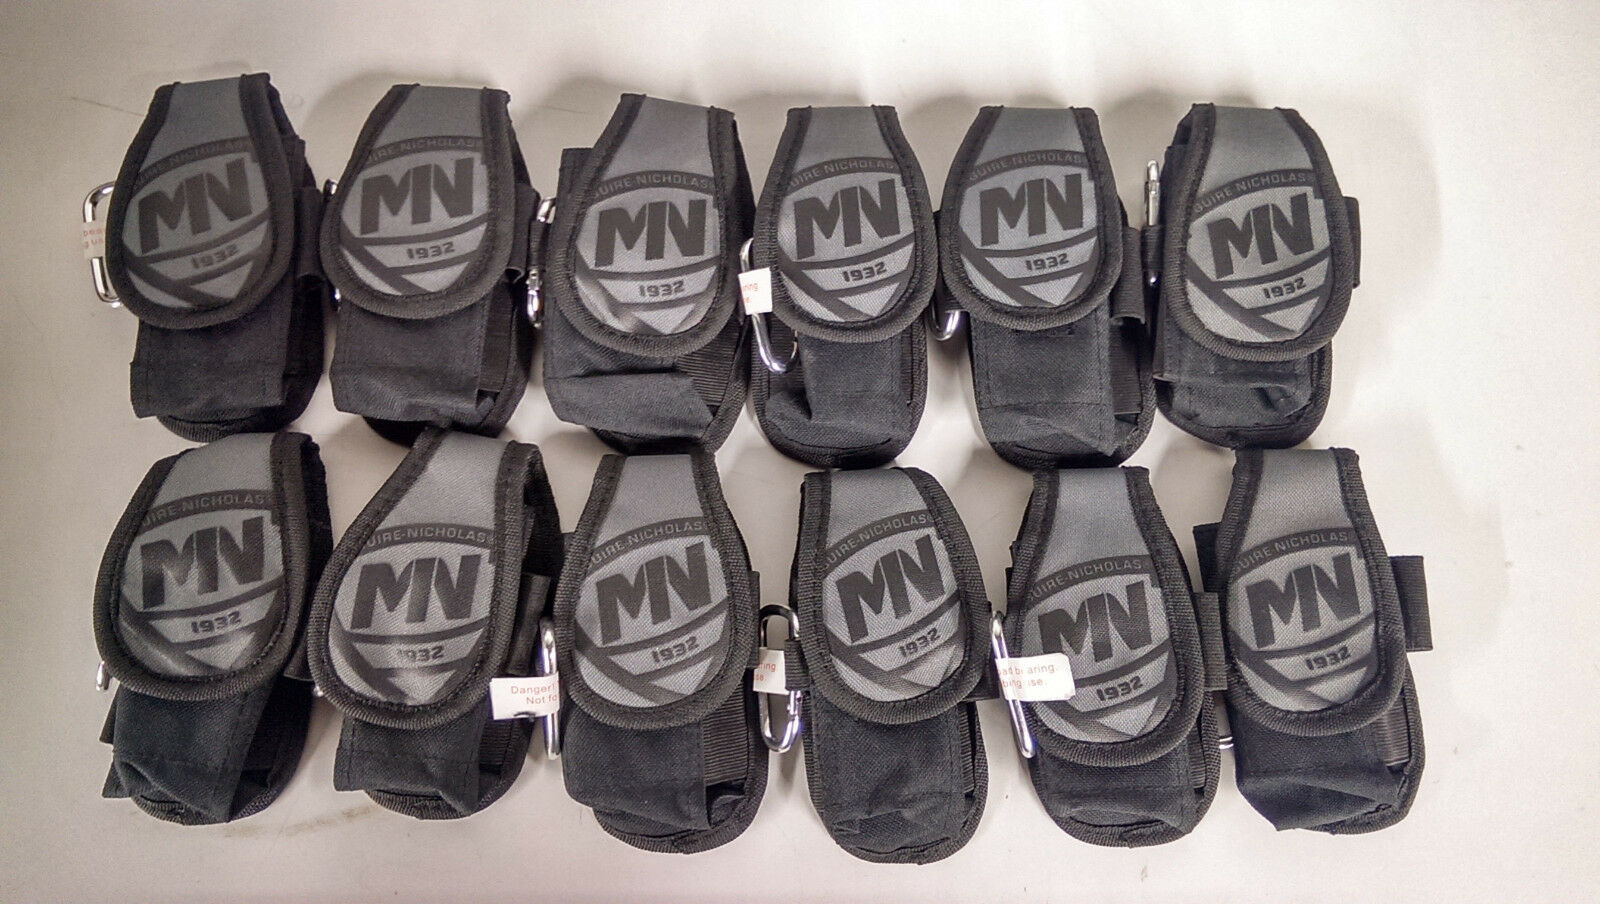 McGuire-Nicholas Polyester Toughwear Adjustable Smart Phone Holder (Lot of 12)